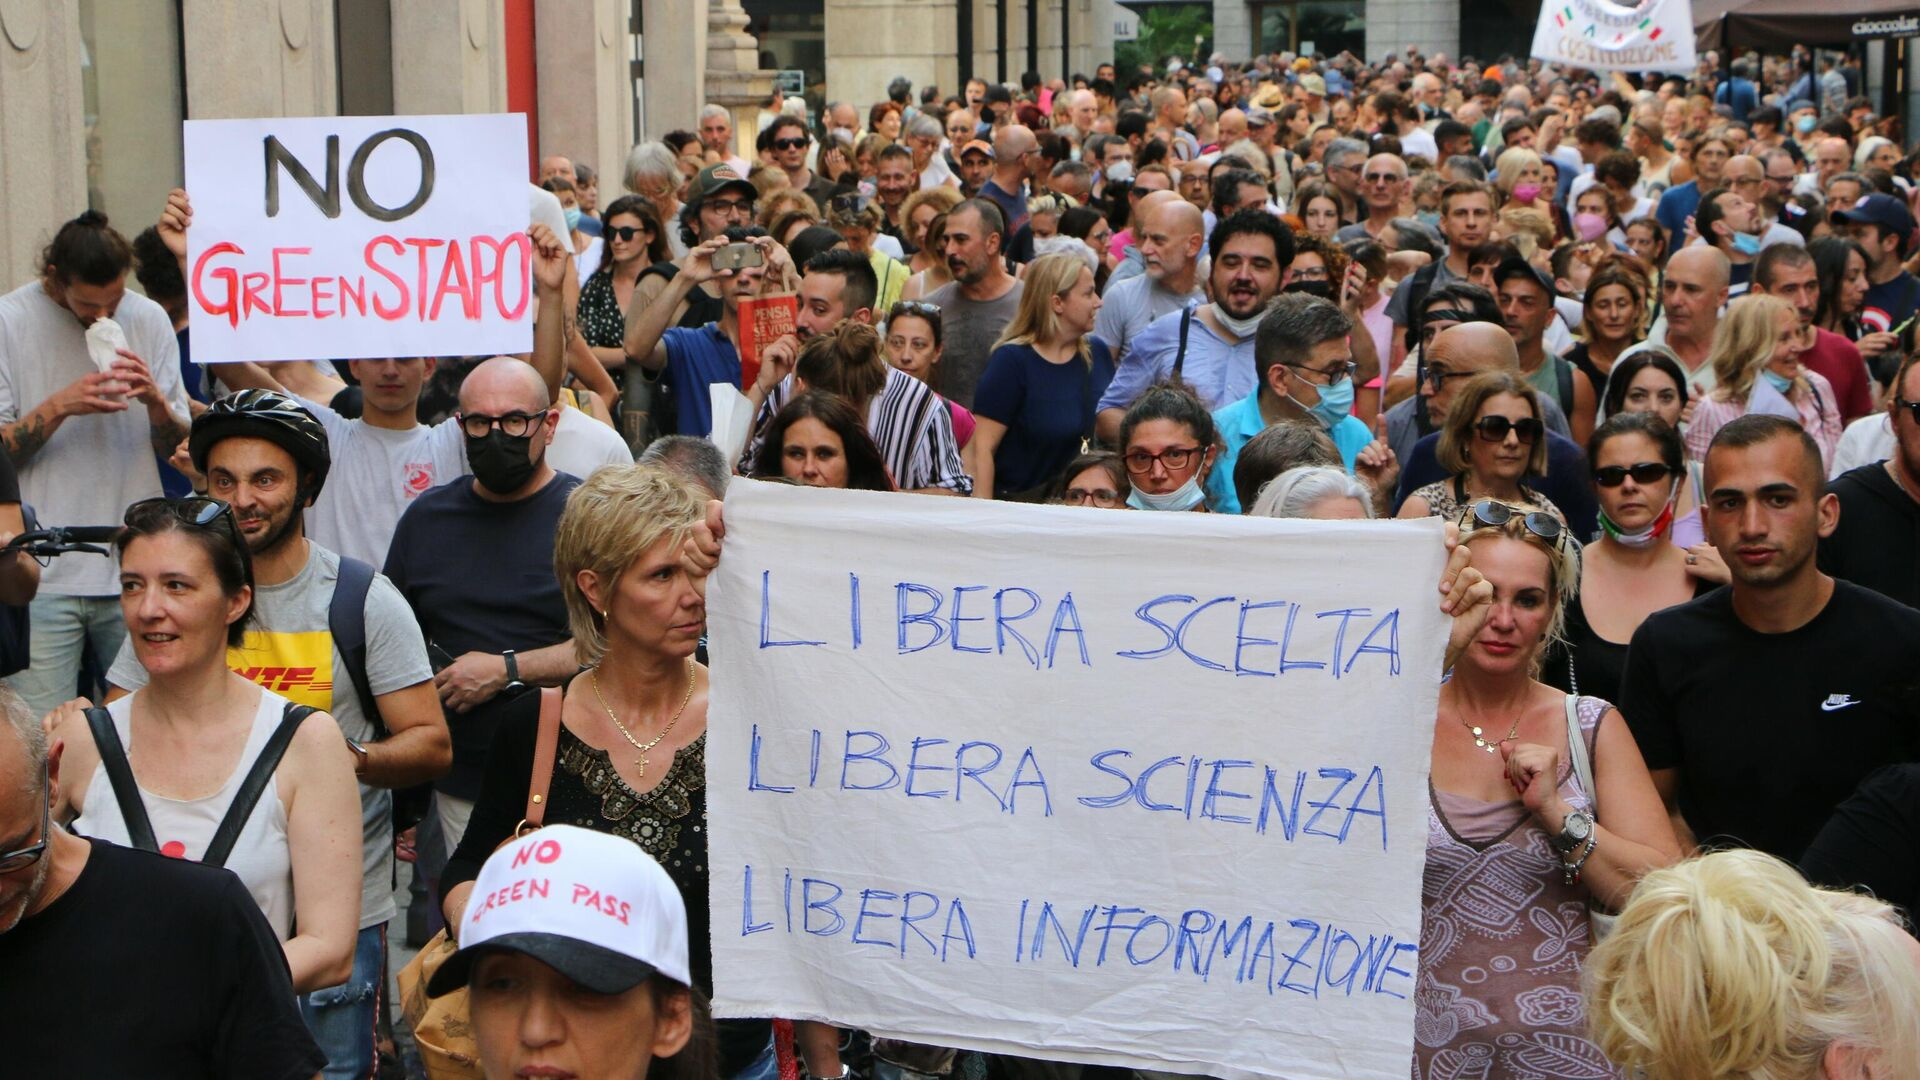 Manifestazione No green pass a Milano - Sputnik Italia, 1920, 25.07.2021